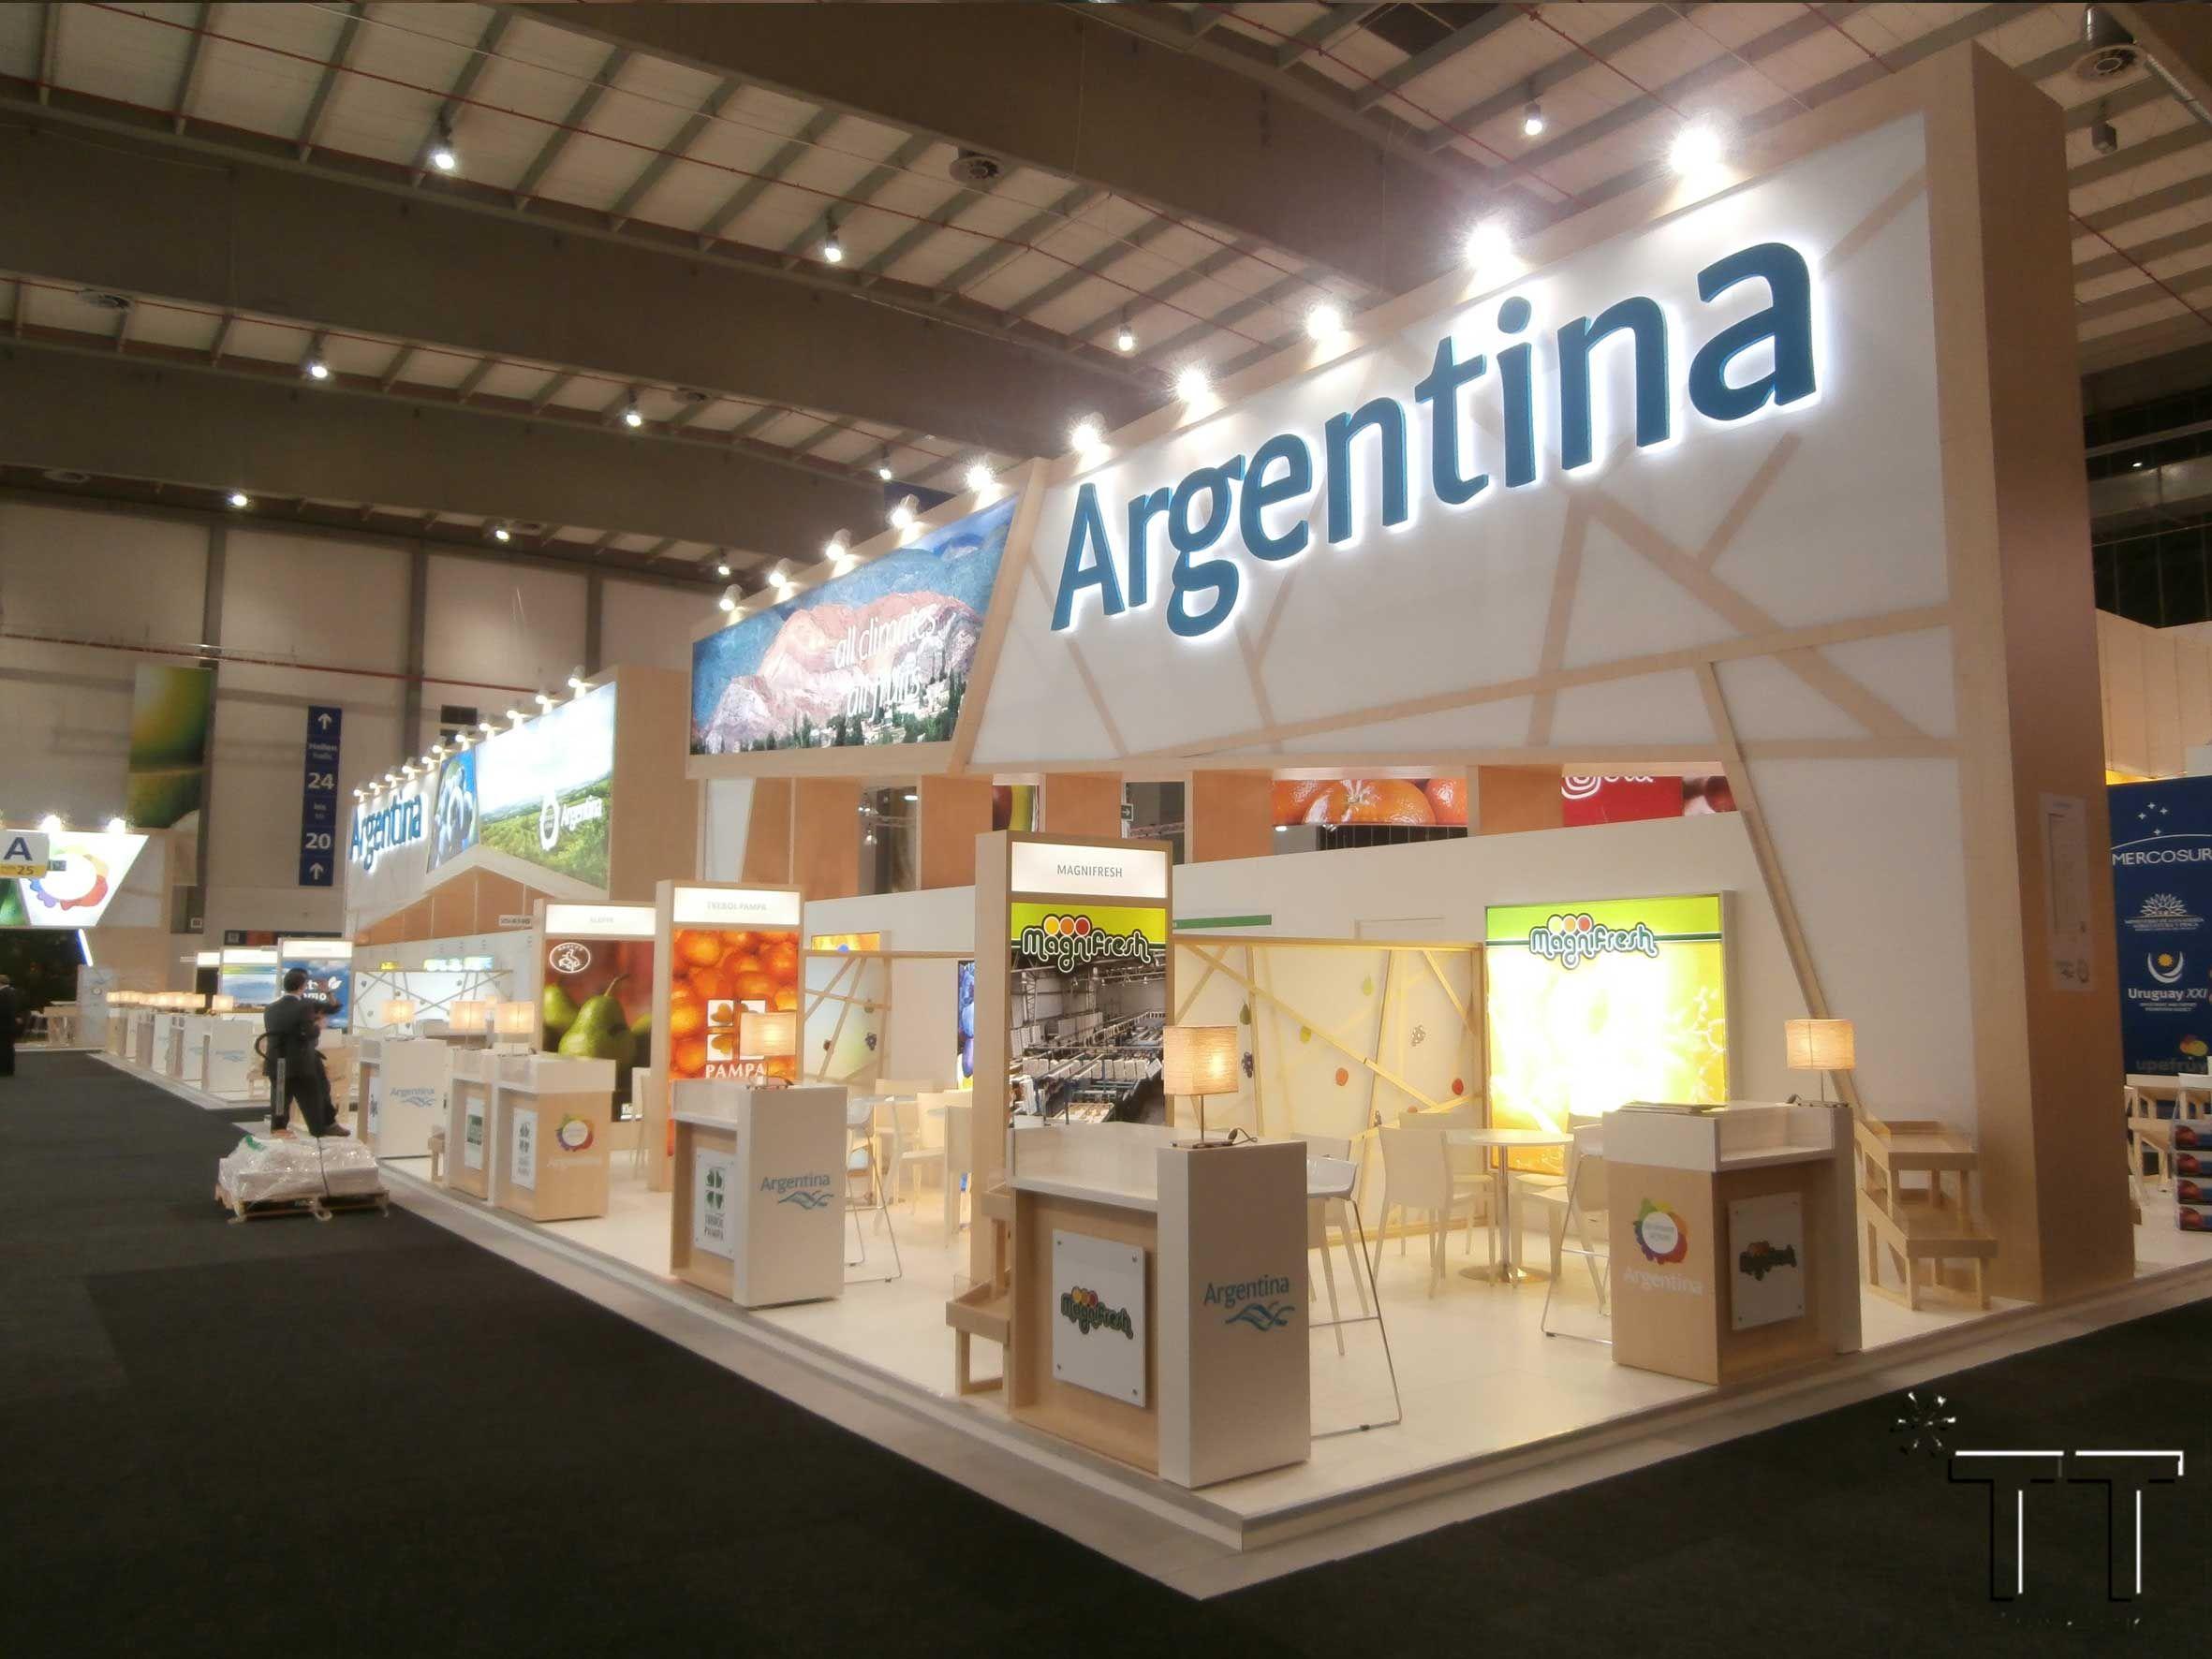 Exhibition Stand Meaning : Tt by think tank diseña y construye el pabellón